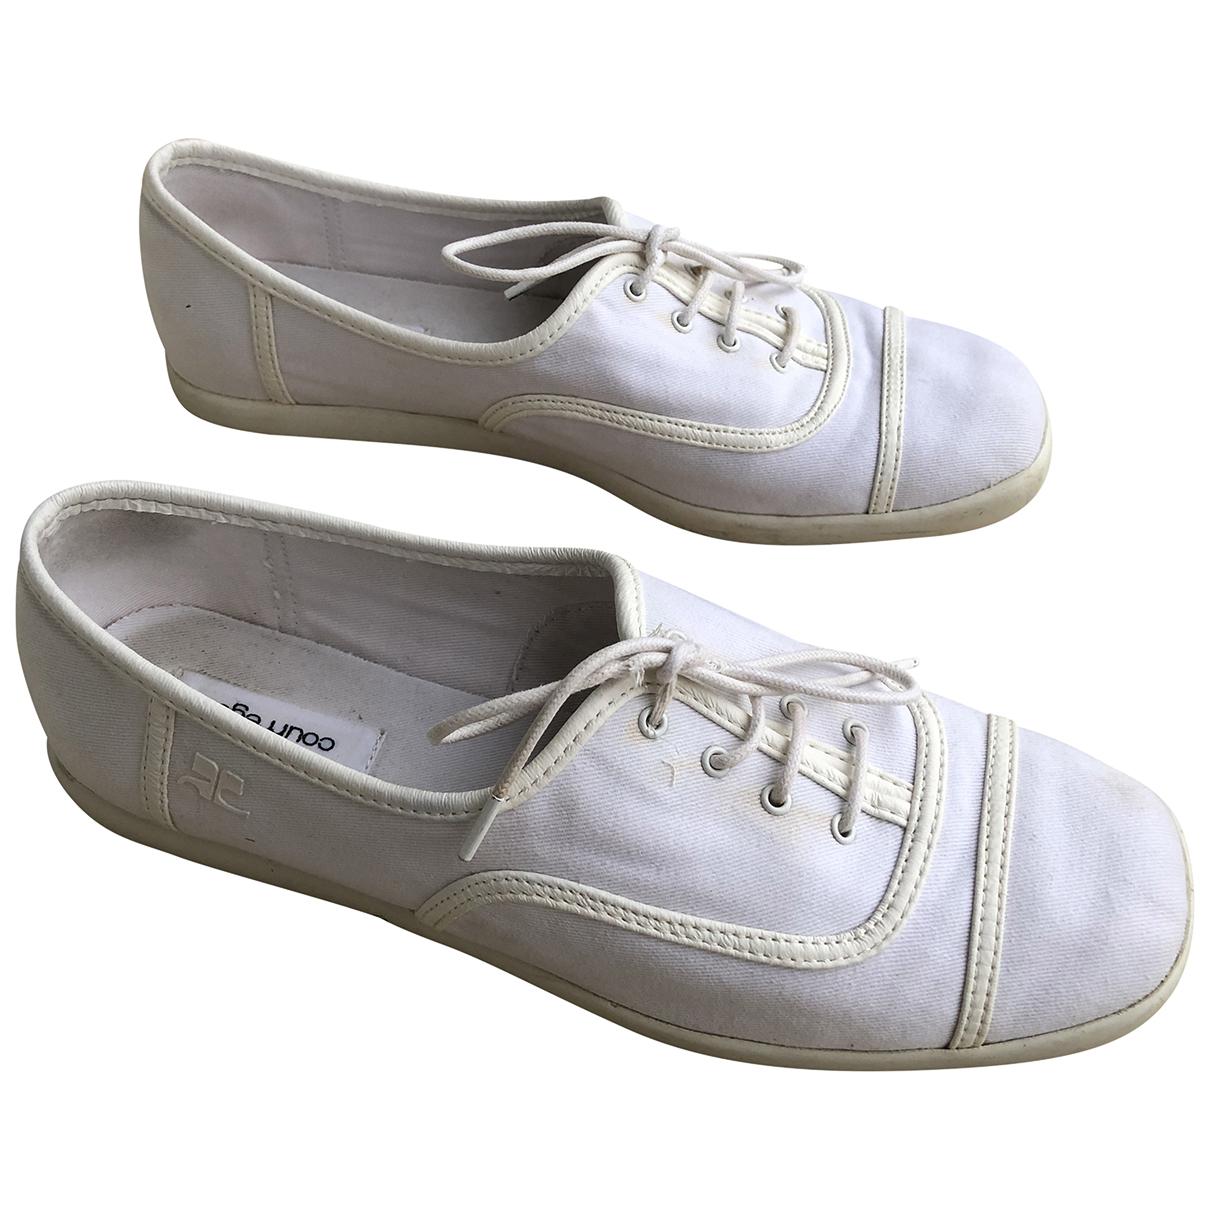 Courreges \N Sneakers in  Weiss Leinen